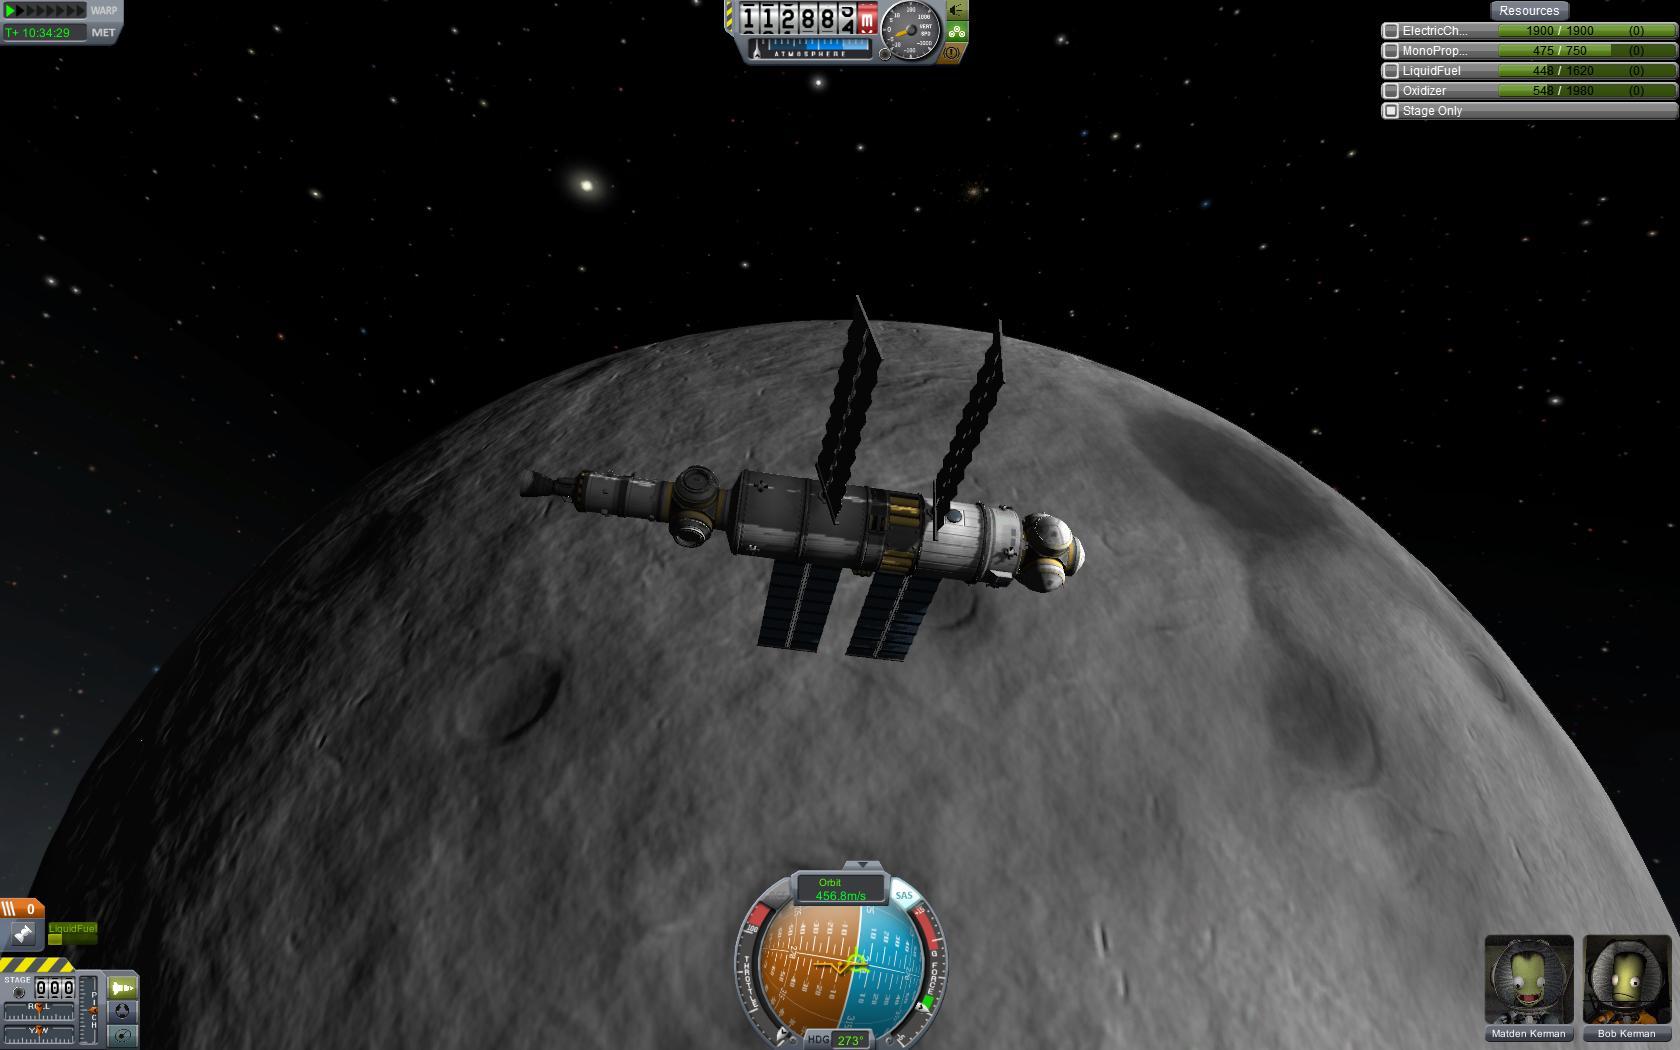 JimbobslimbobWeb - Kerbal Space Program - Greatest Achievements